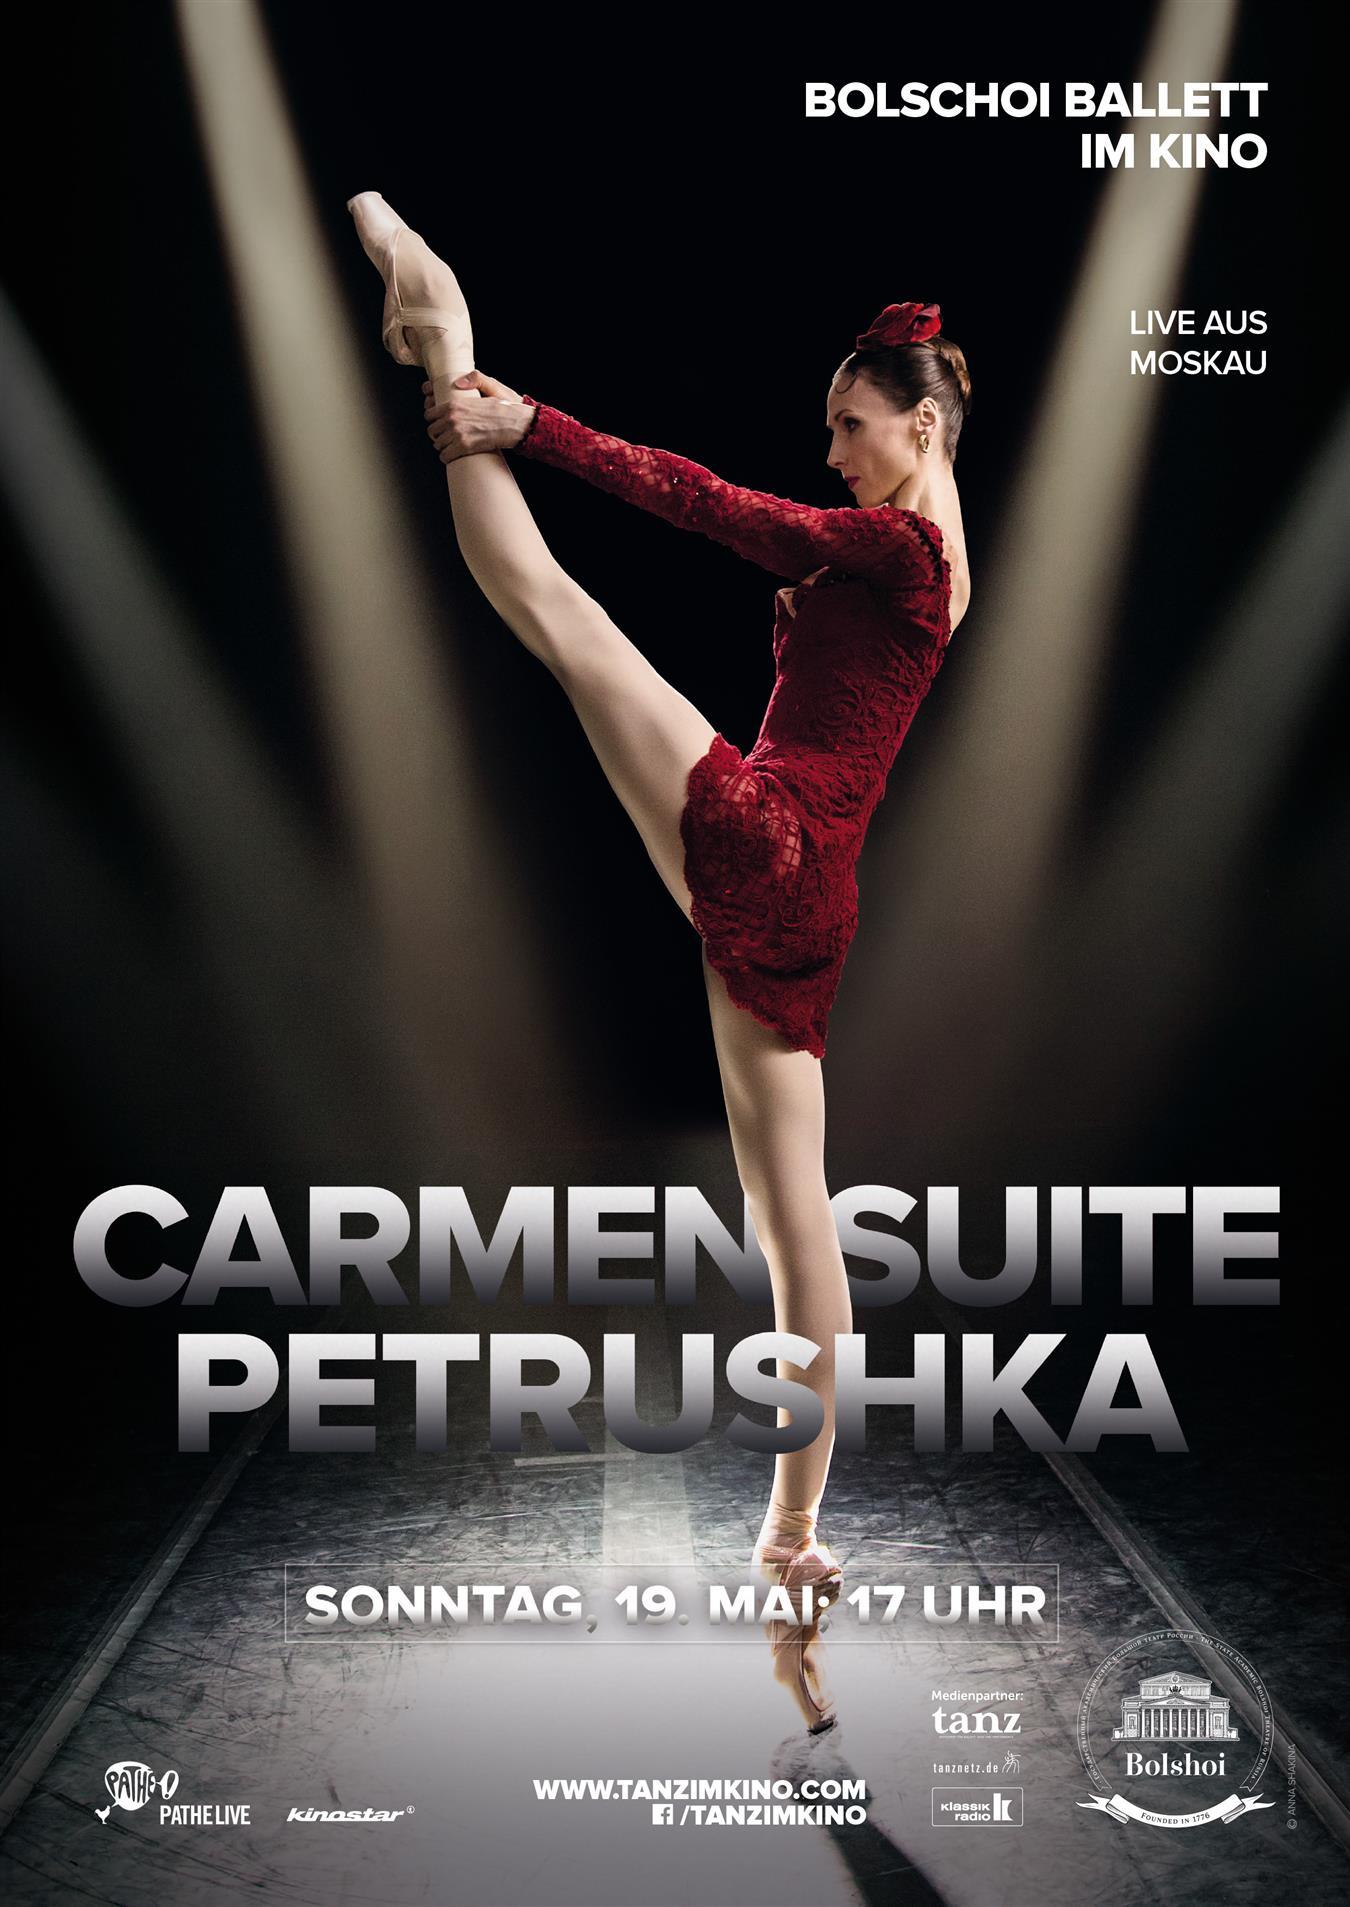 Bolschoi Ballett: CARMEN/PETRUSHKA (live)